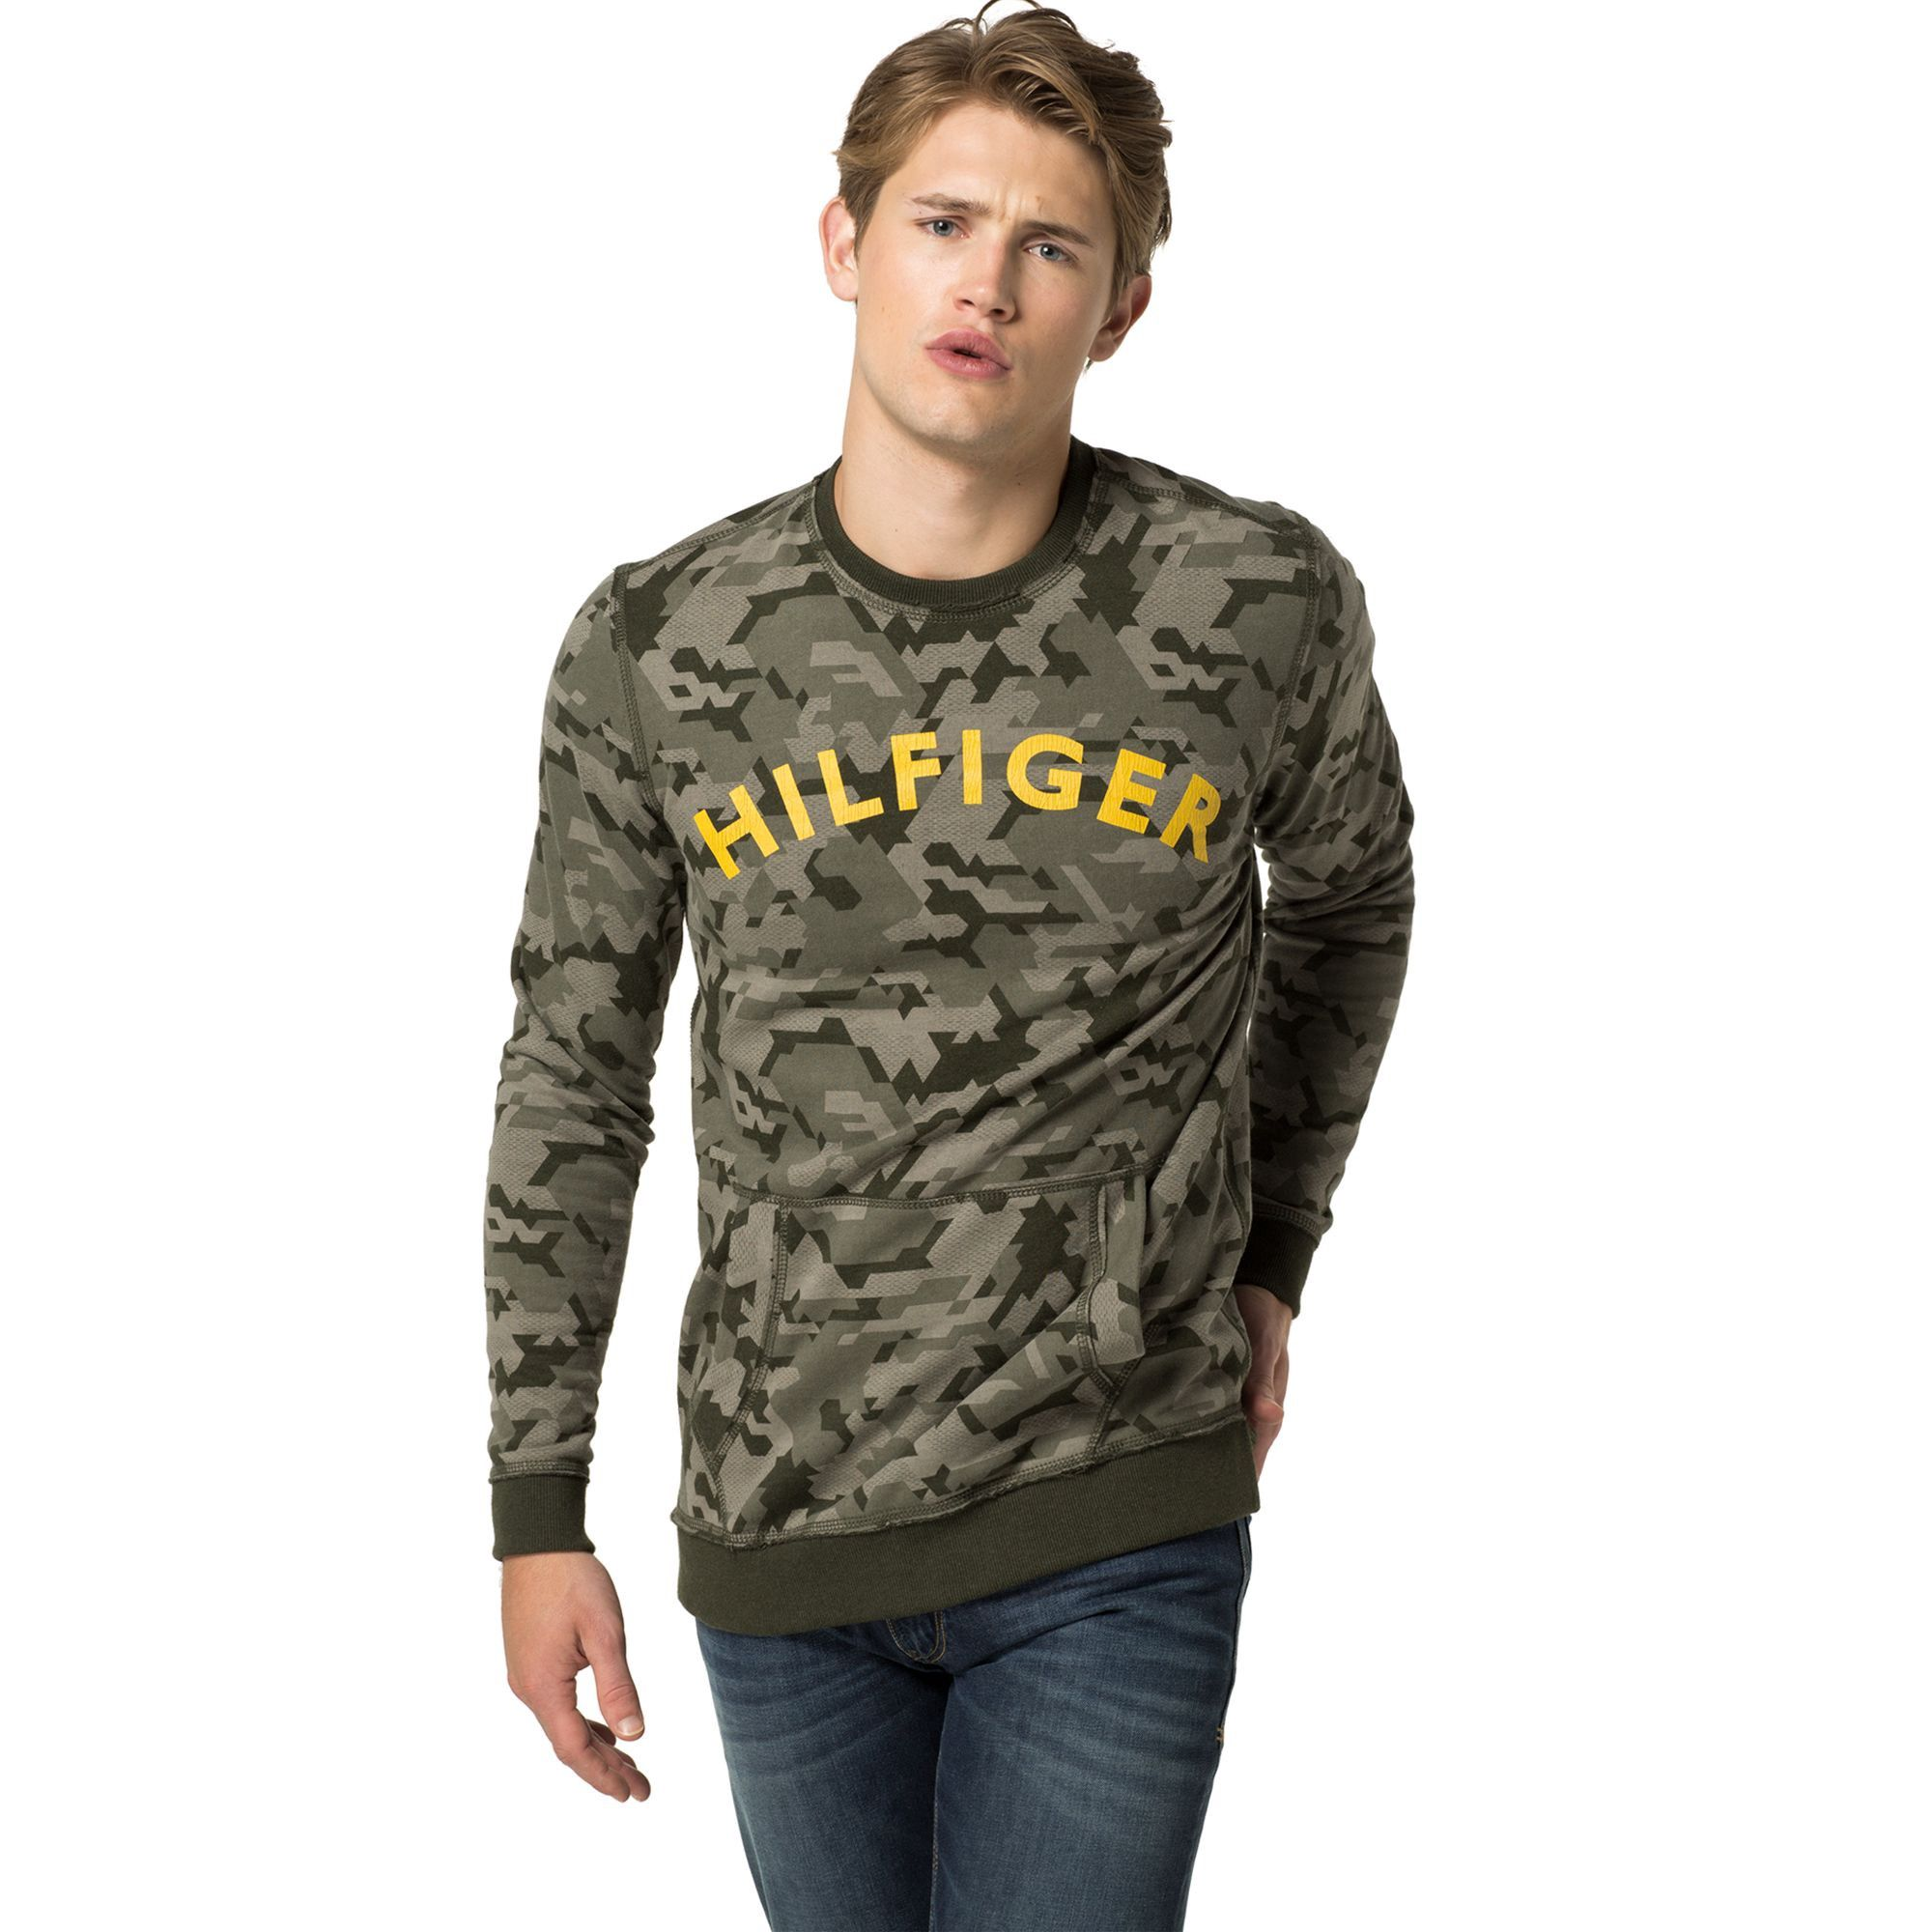 b848d5fc0 TOMMY HILFIGER CAMO FLEECE - CAMOUFLAGE FOREST NIGHT. #tommyhilfiger ...